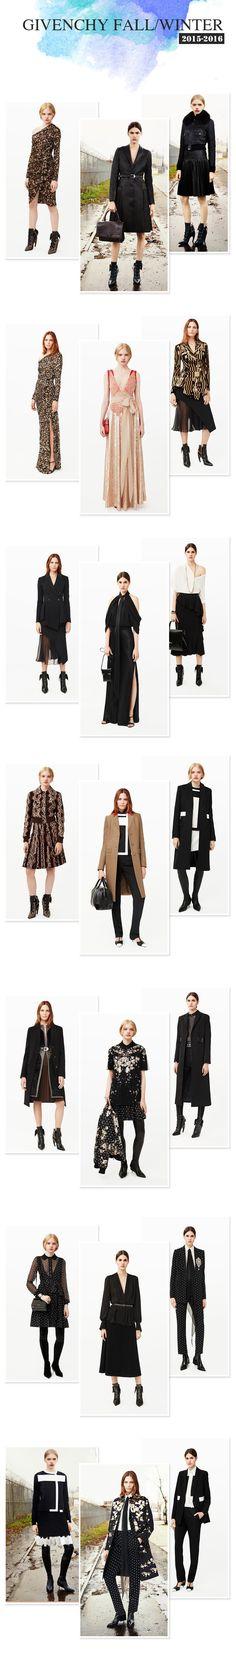 Givenchy Fall/Winter 2015-2016